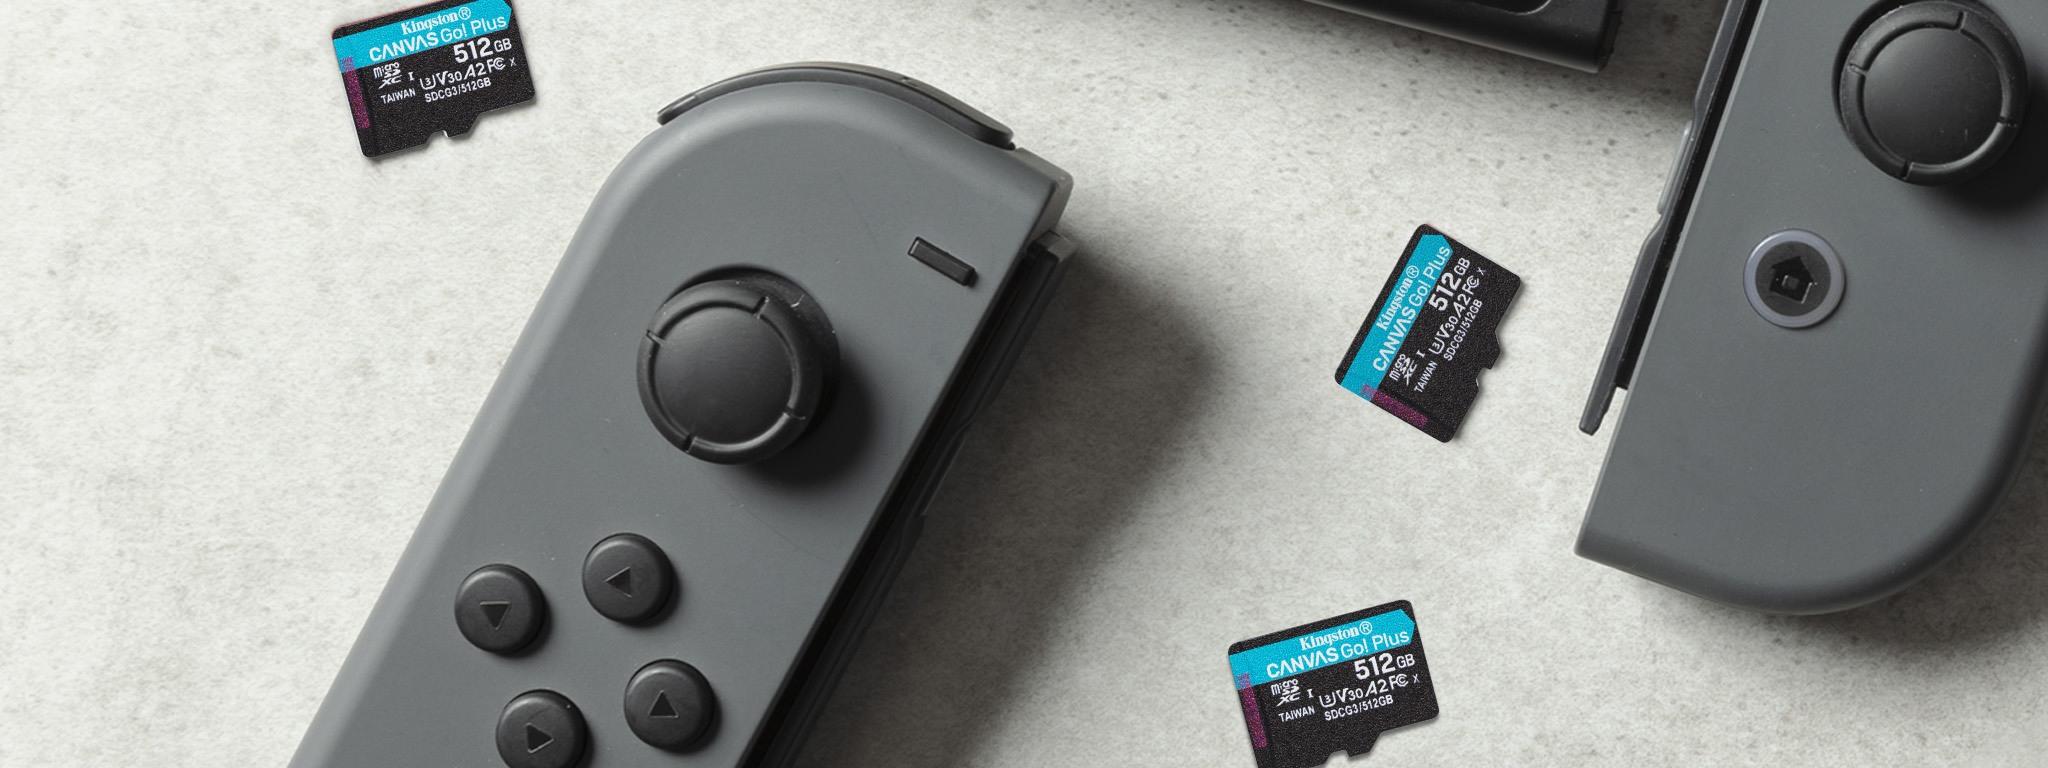 Kingston Go!桌上的 Nintendo Switch 裝載 Plus microSD